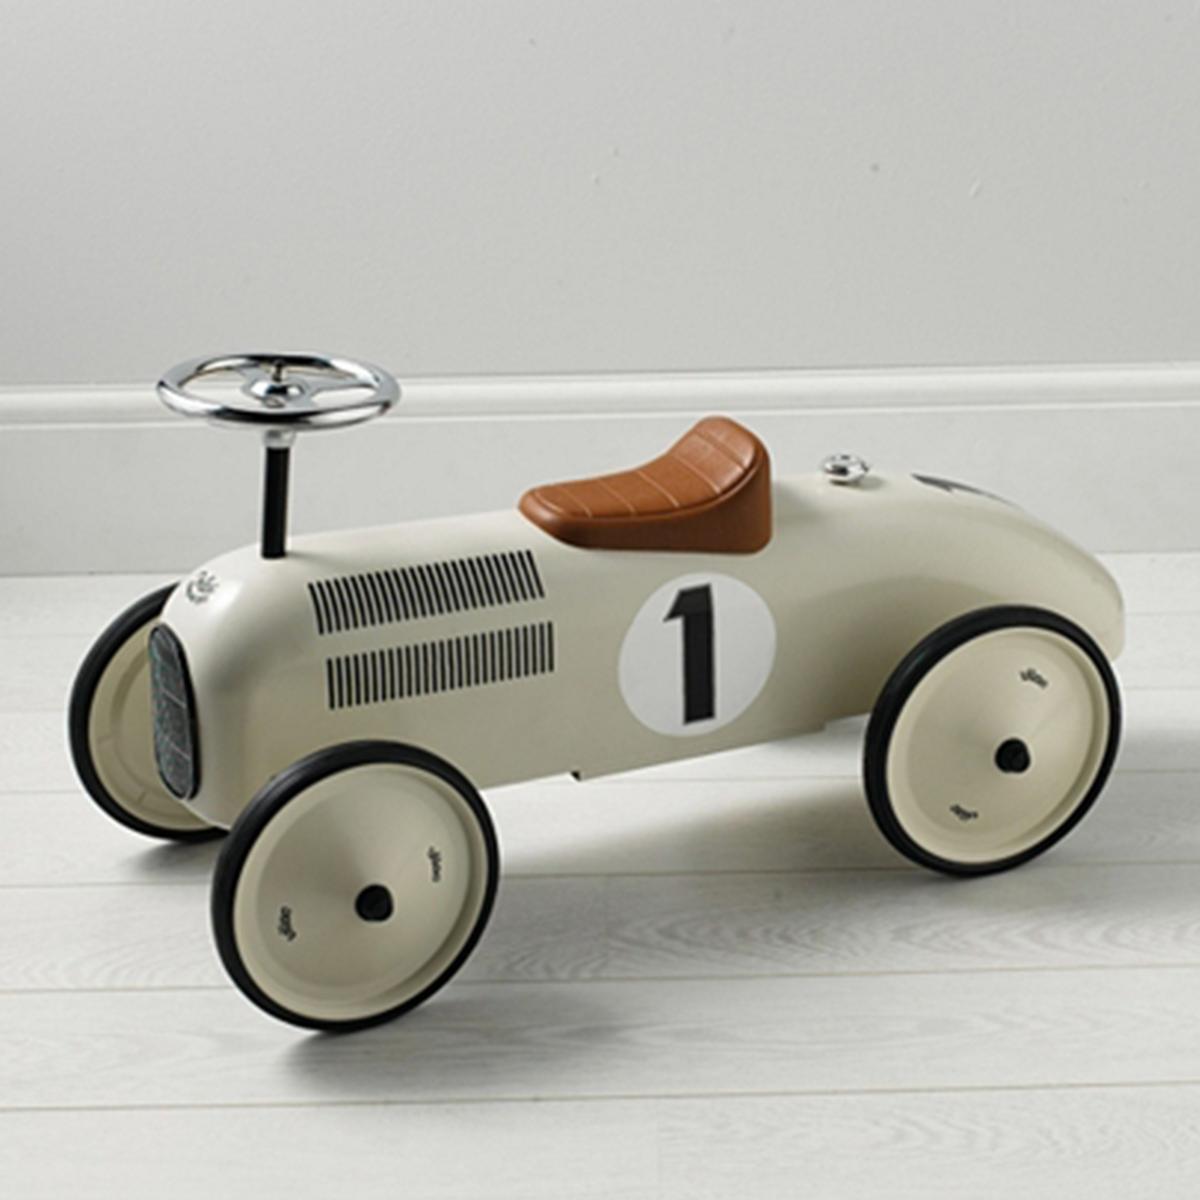 Ride-On Vintage Children\'s Toy Car - Find Love Buy